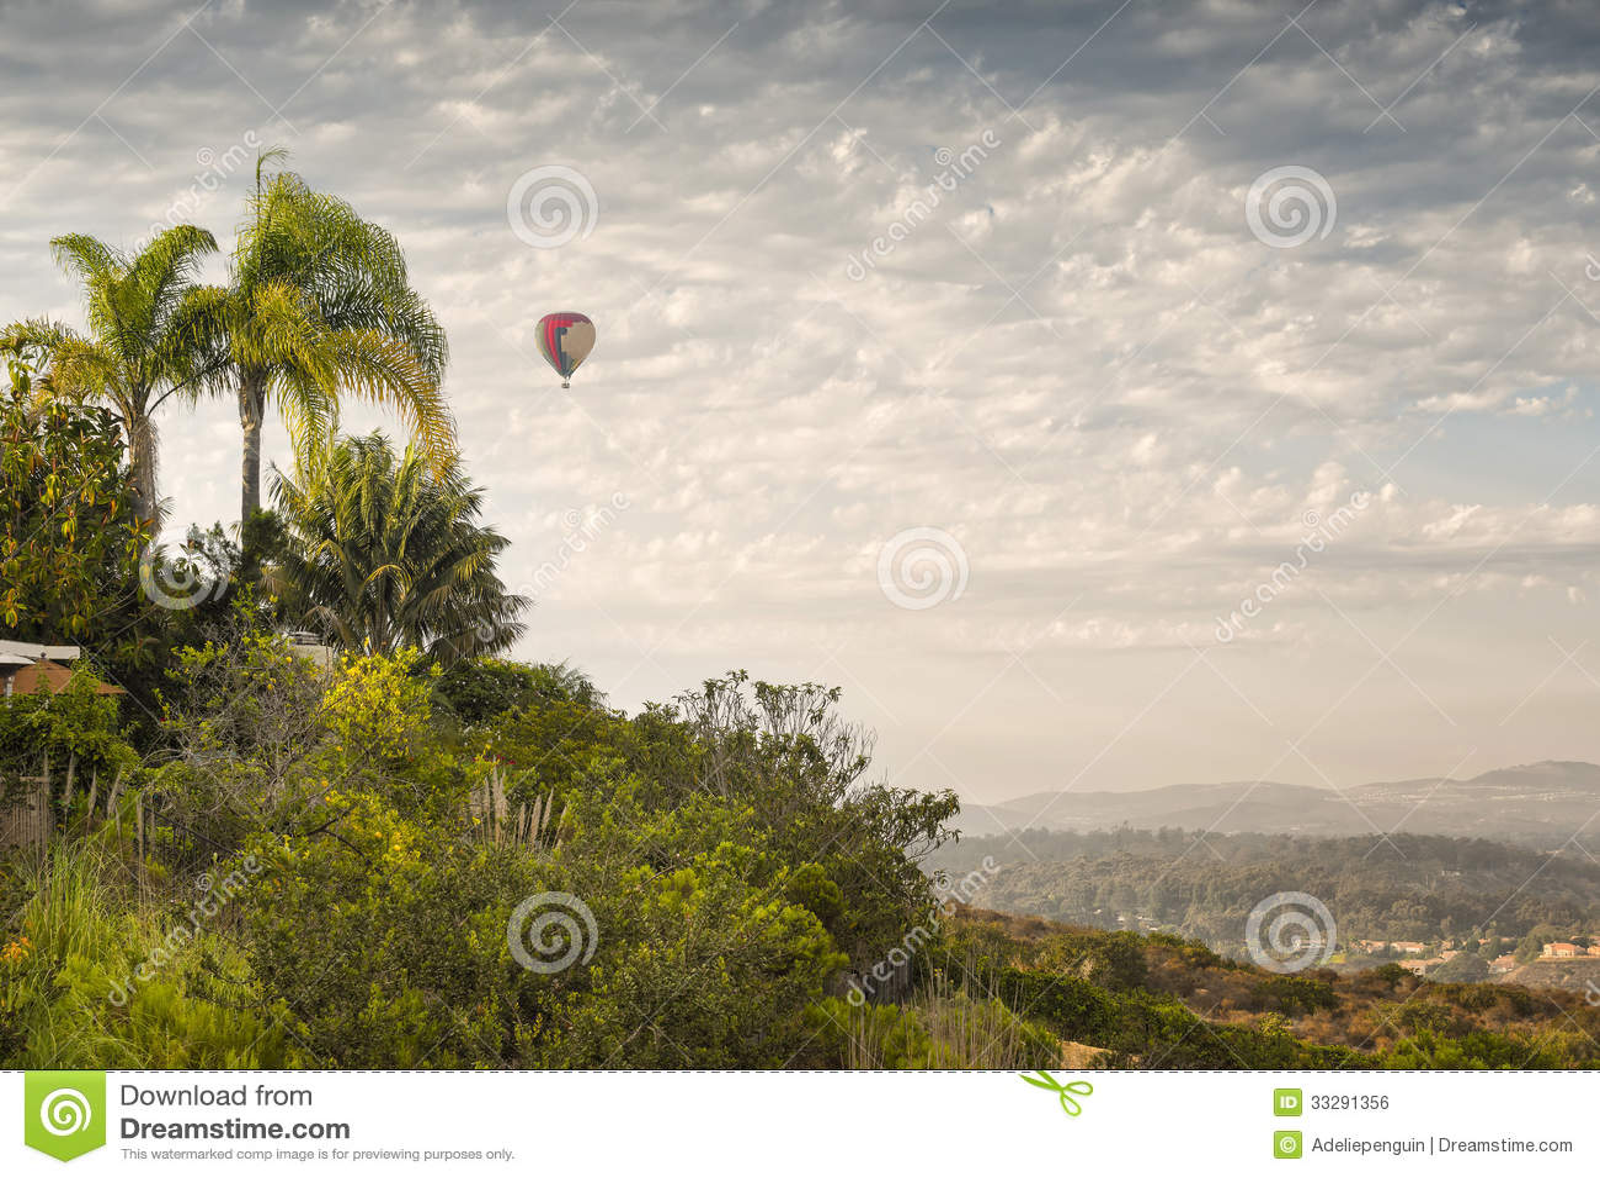 Hot Air Balloon In Flight San Diego California Royalty